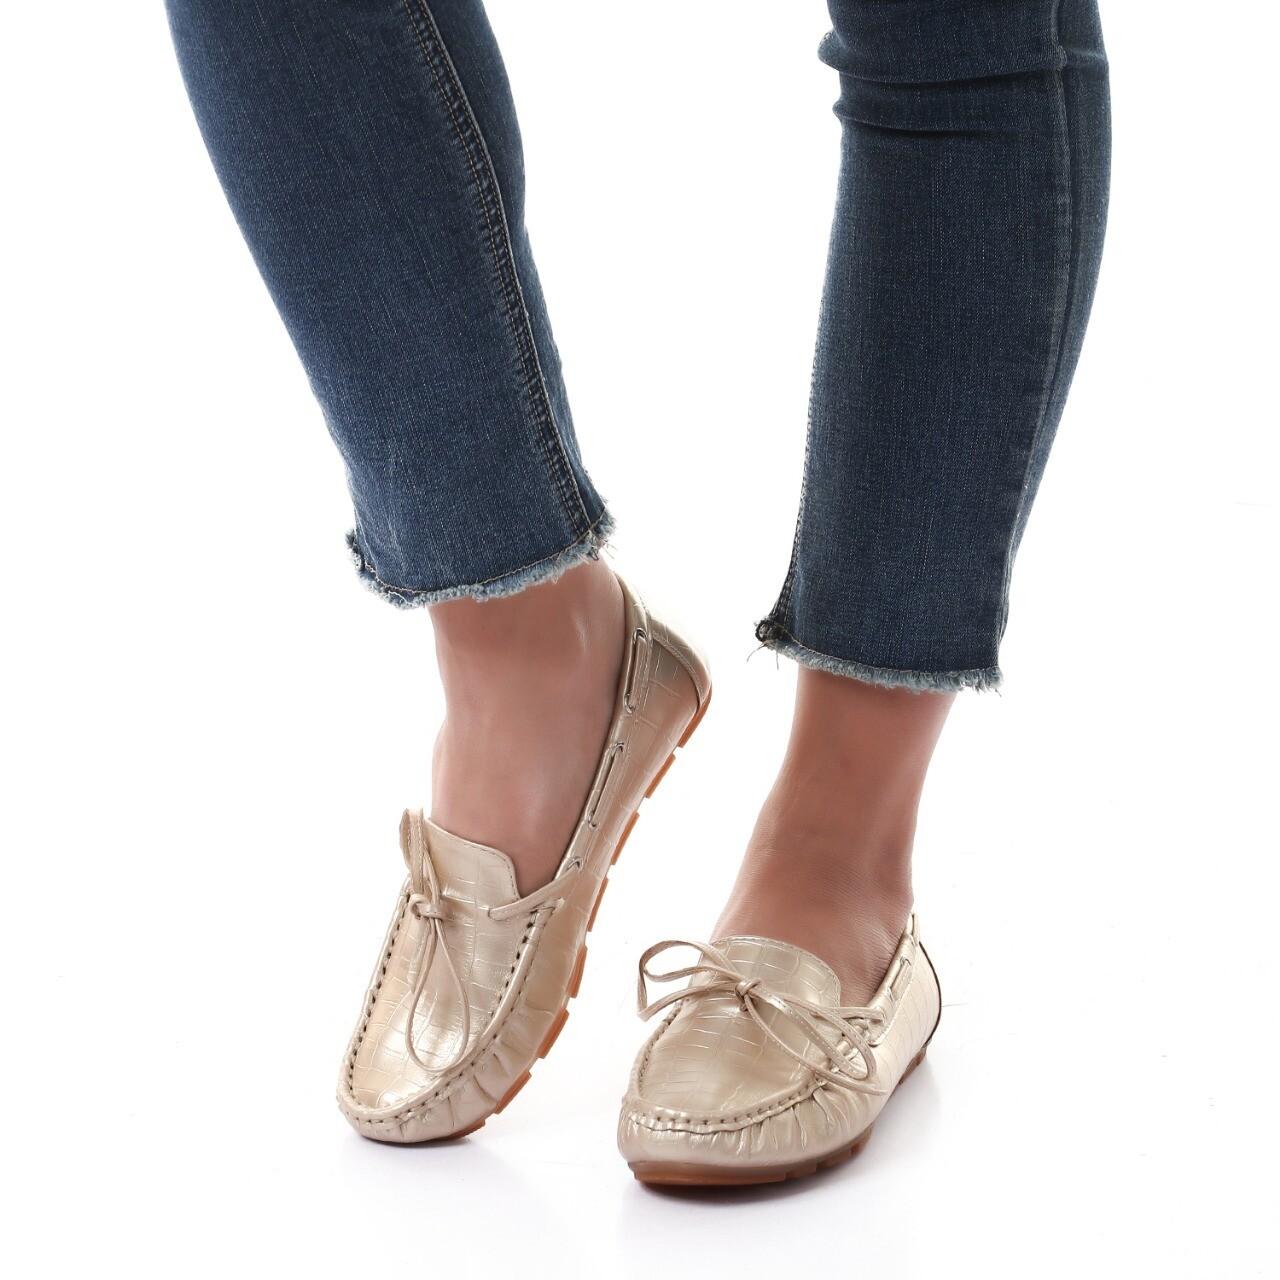 3457 Ballet Flat Shoes - gold